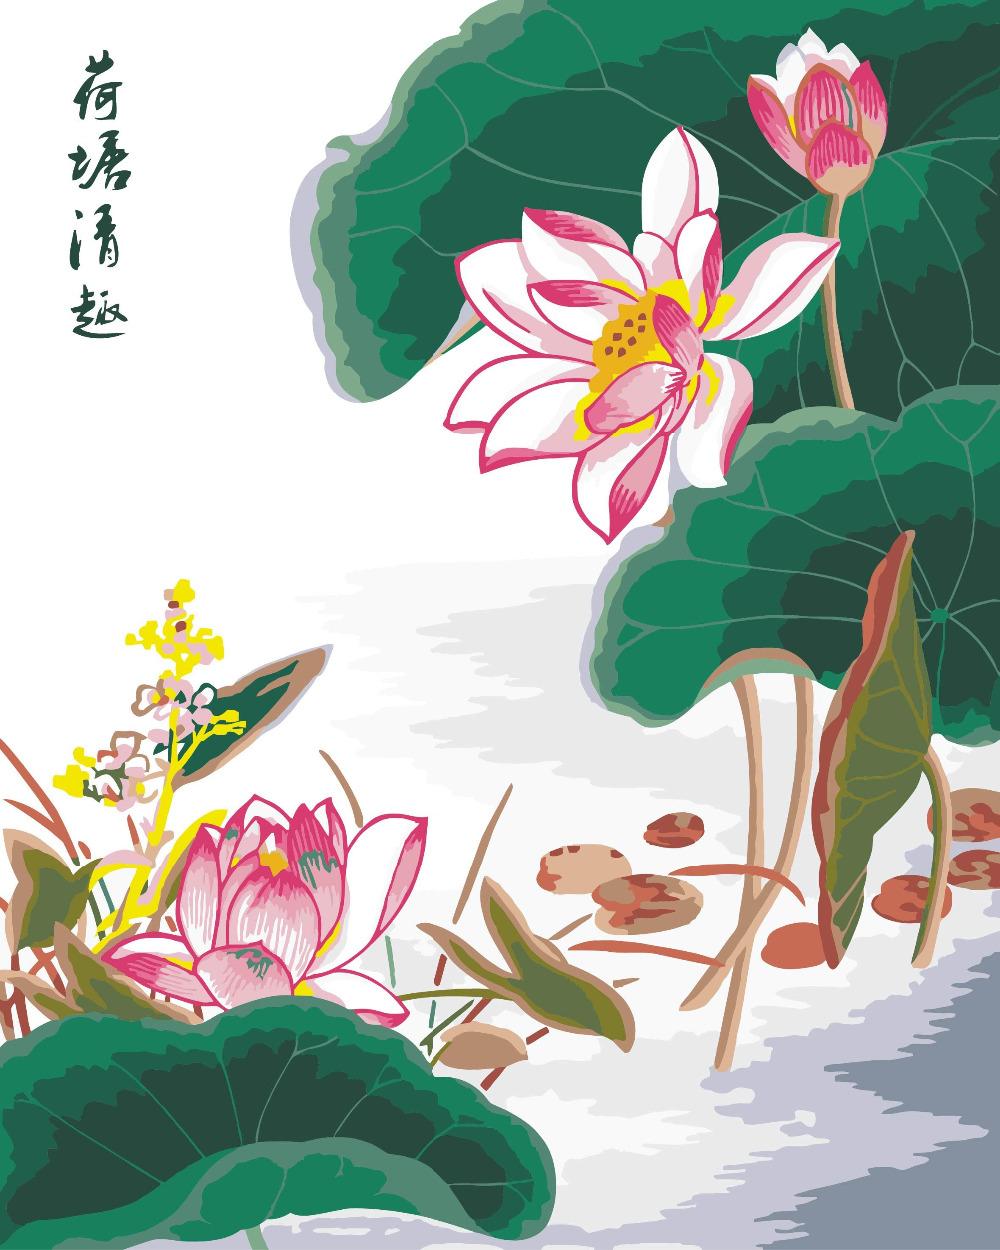 mahuafx rosa luts estanque flor x cm pintura by nmeros en lienzo sobre el